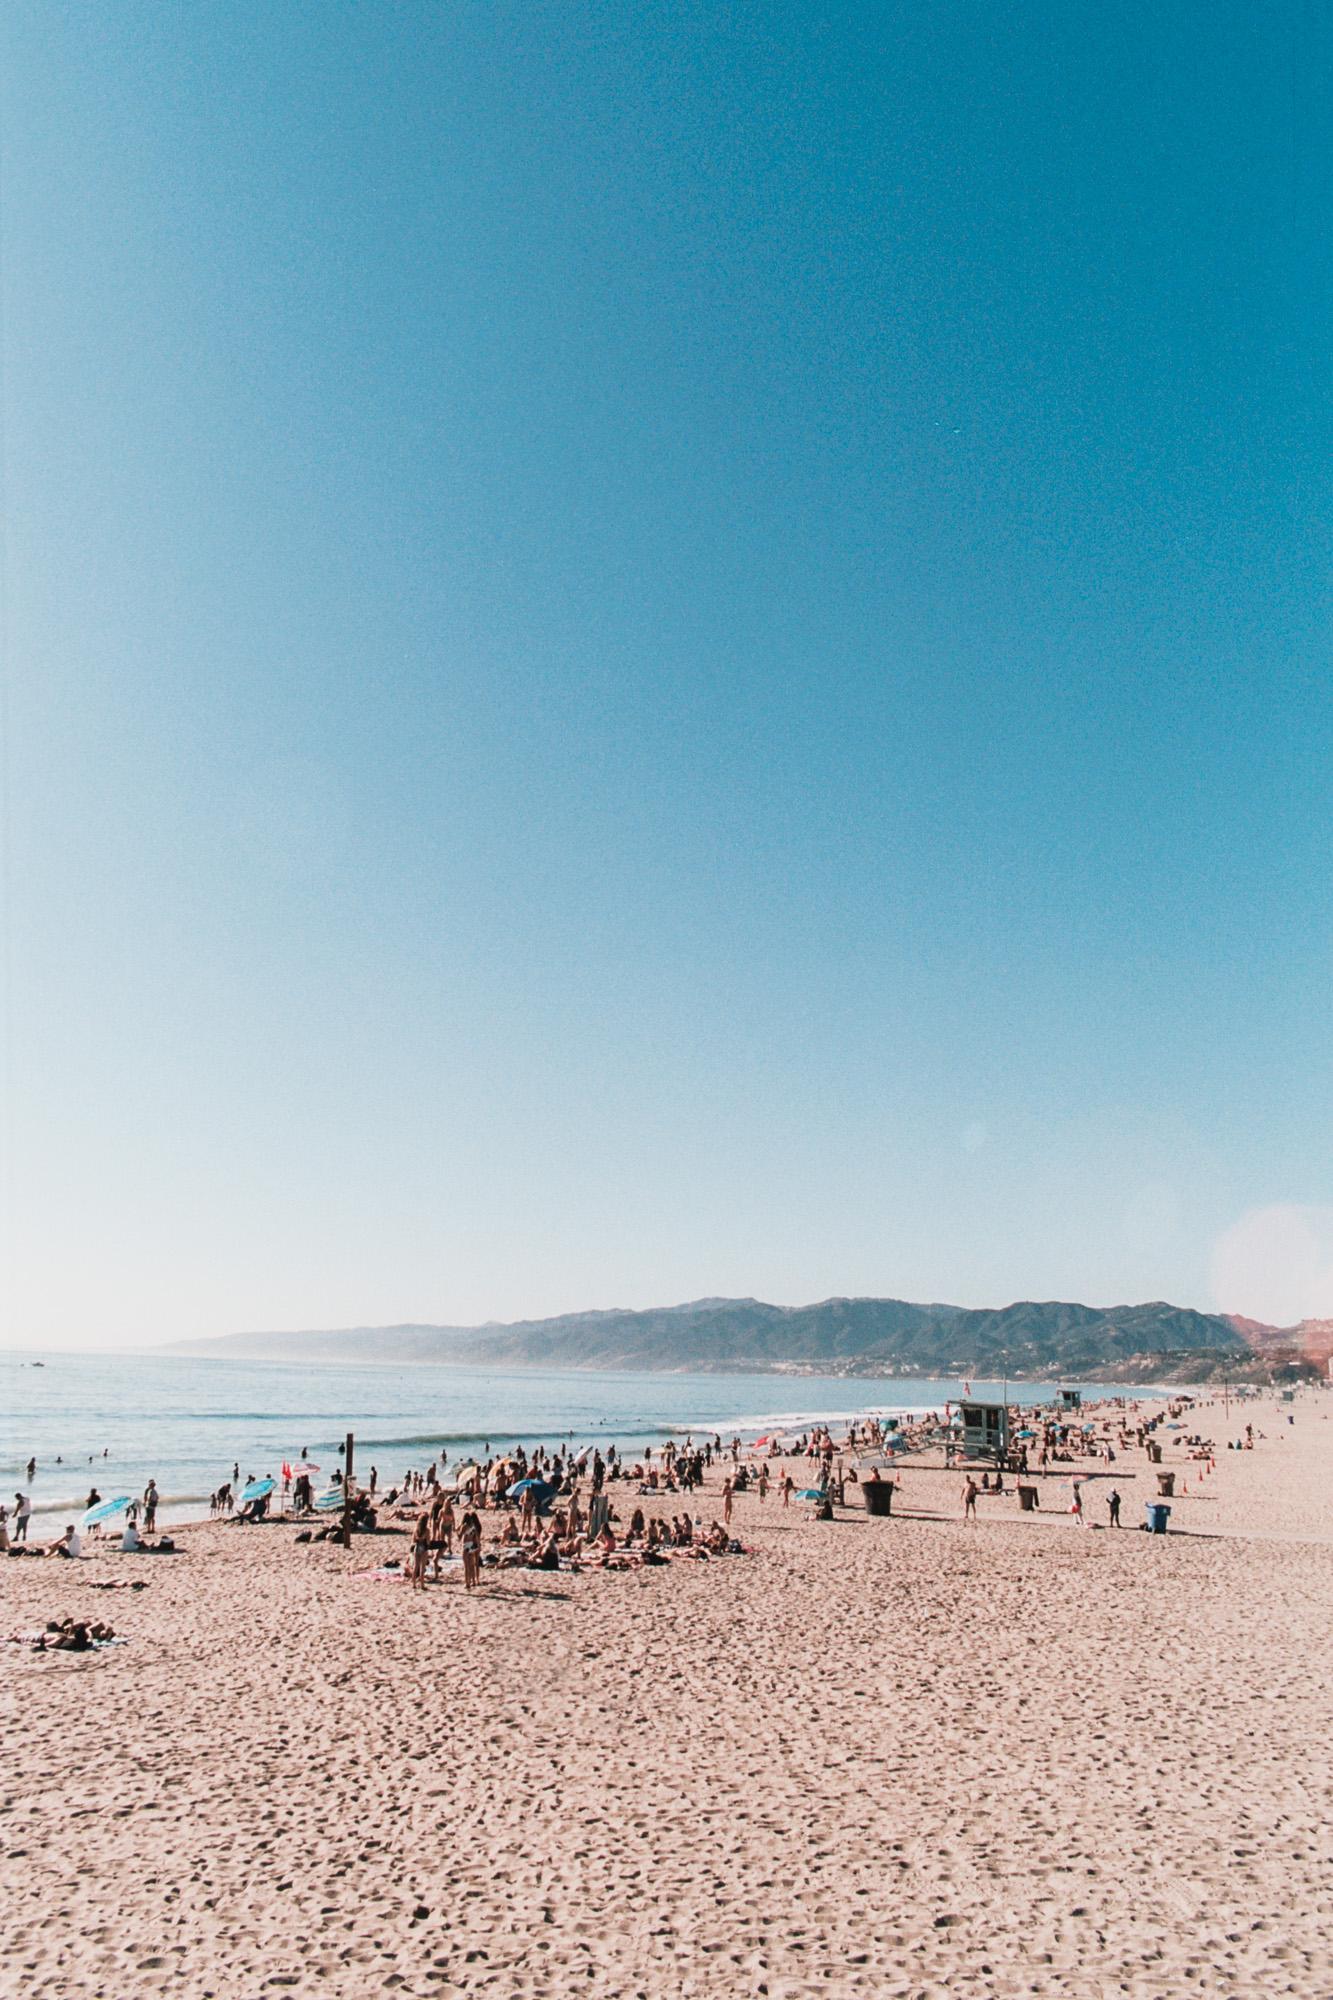 california8_10MB.jpg